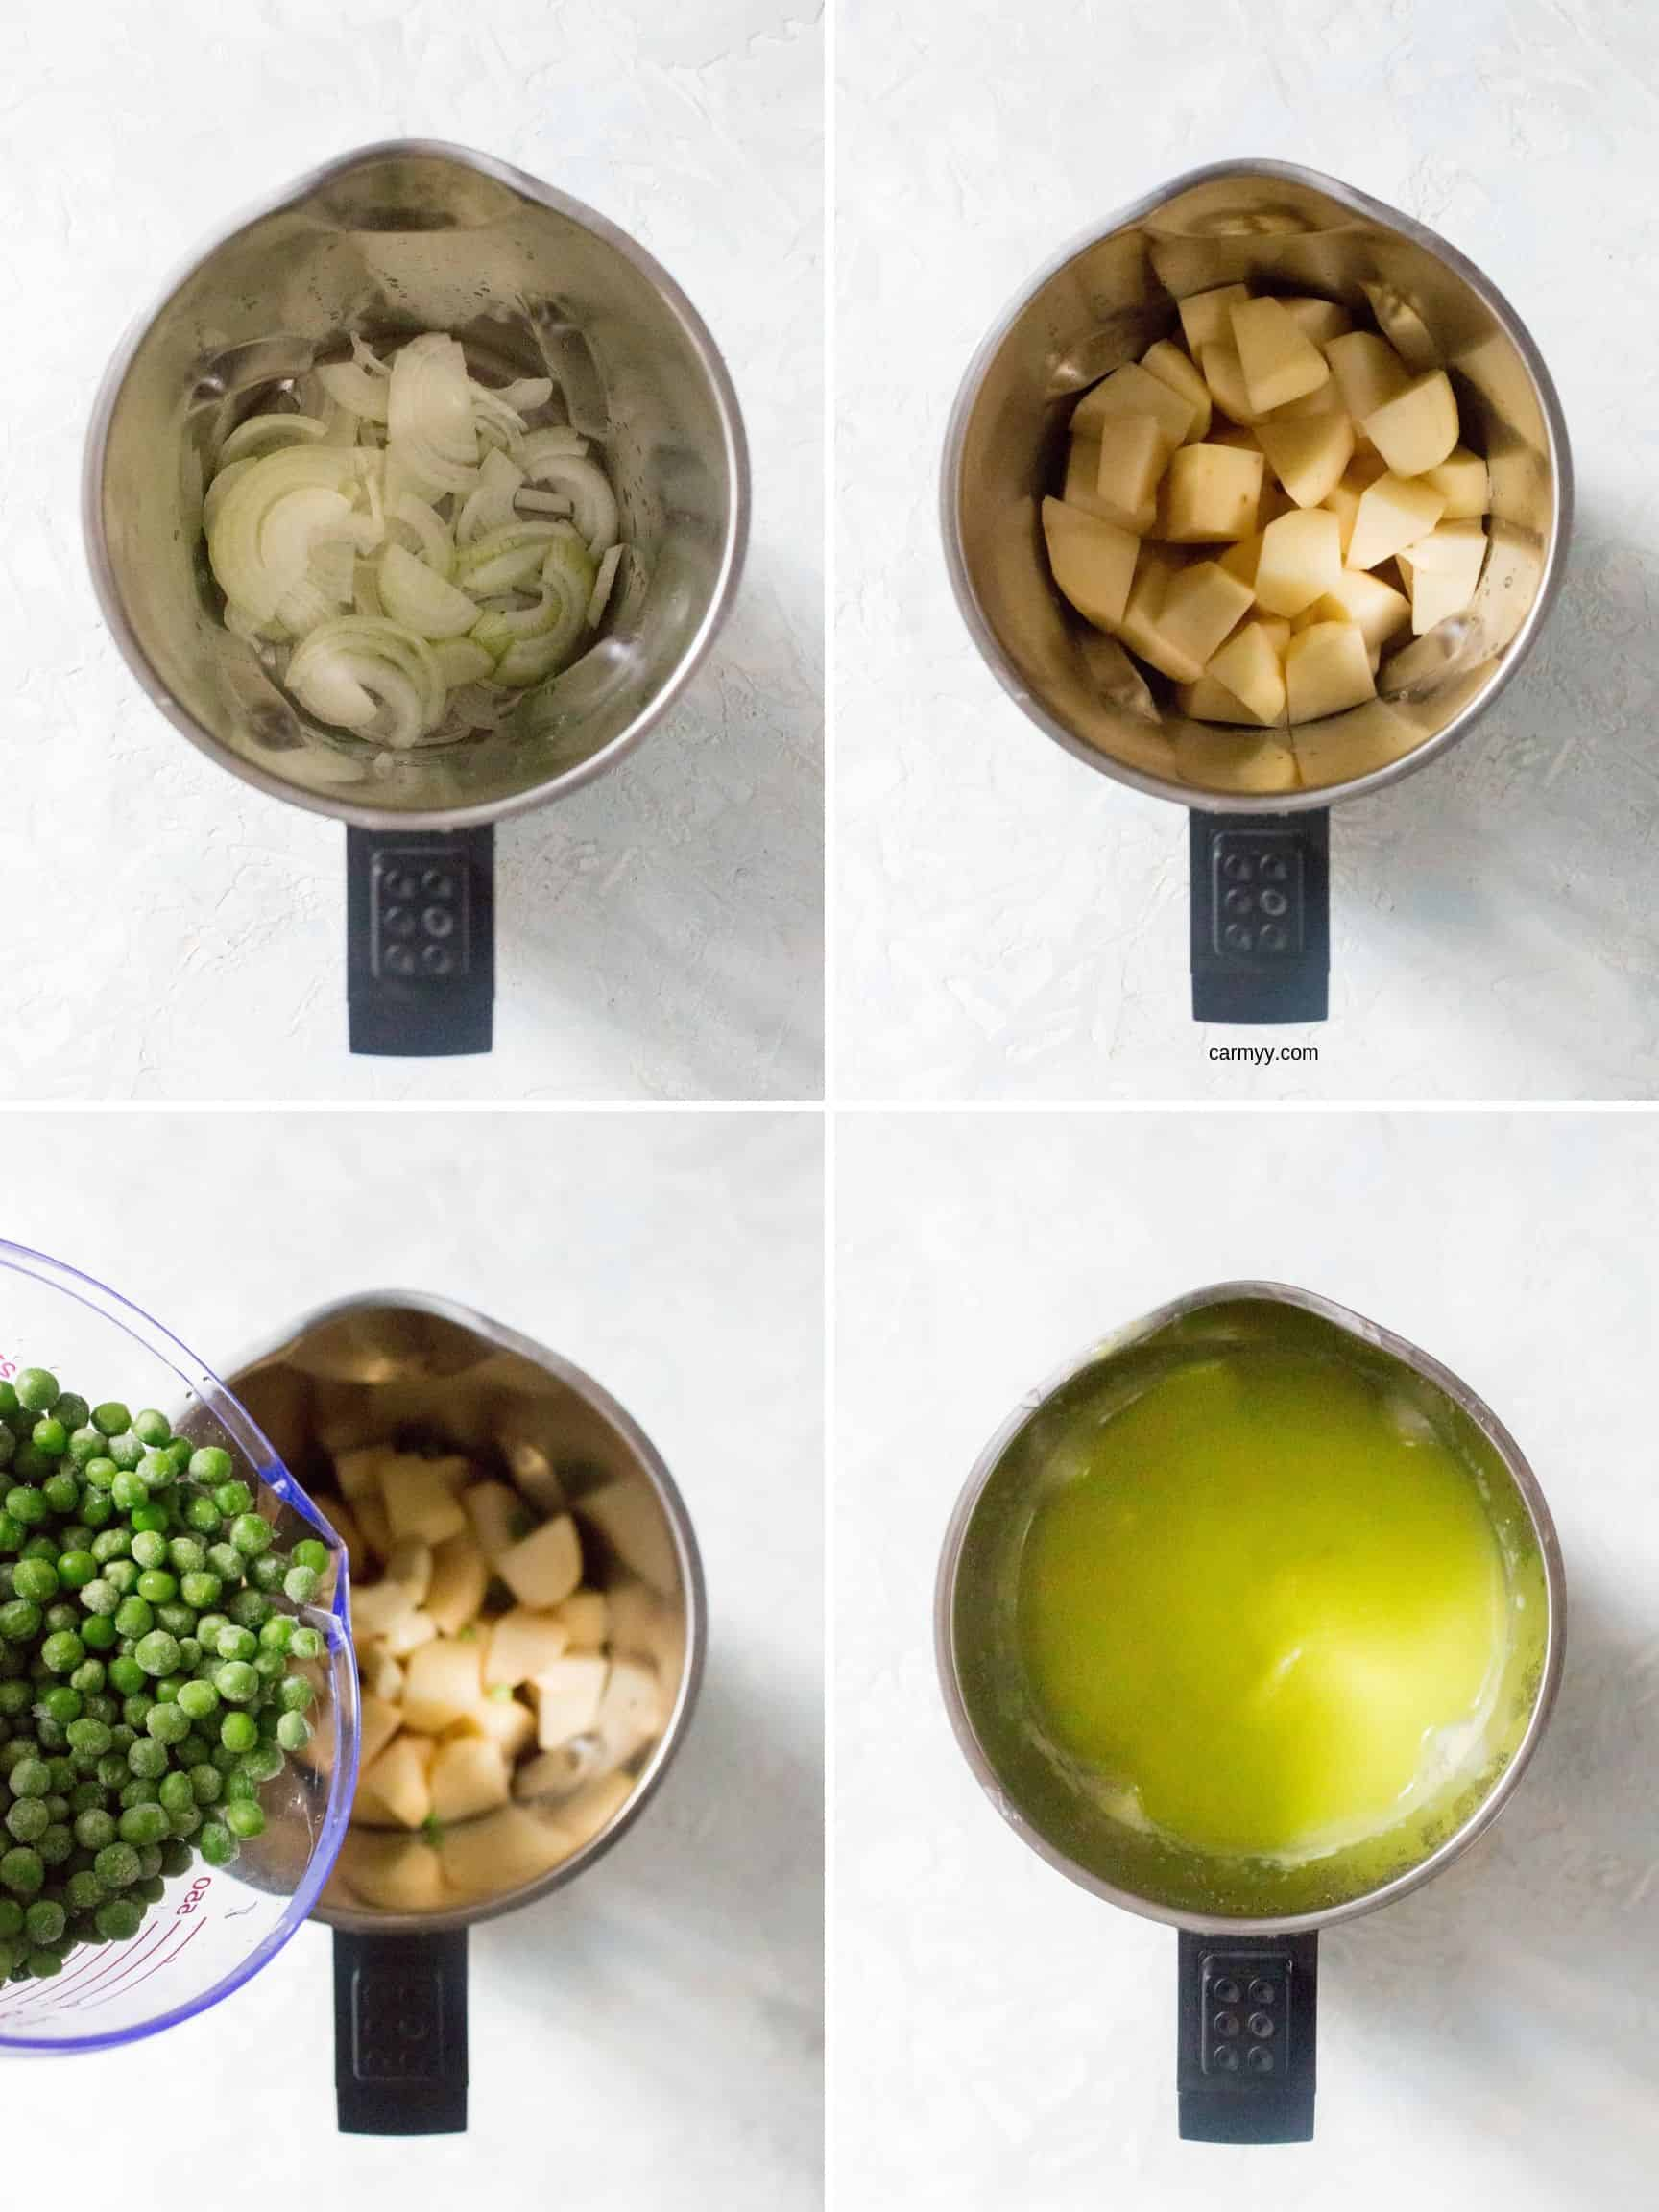 ingredients inside the philips soupmaker.